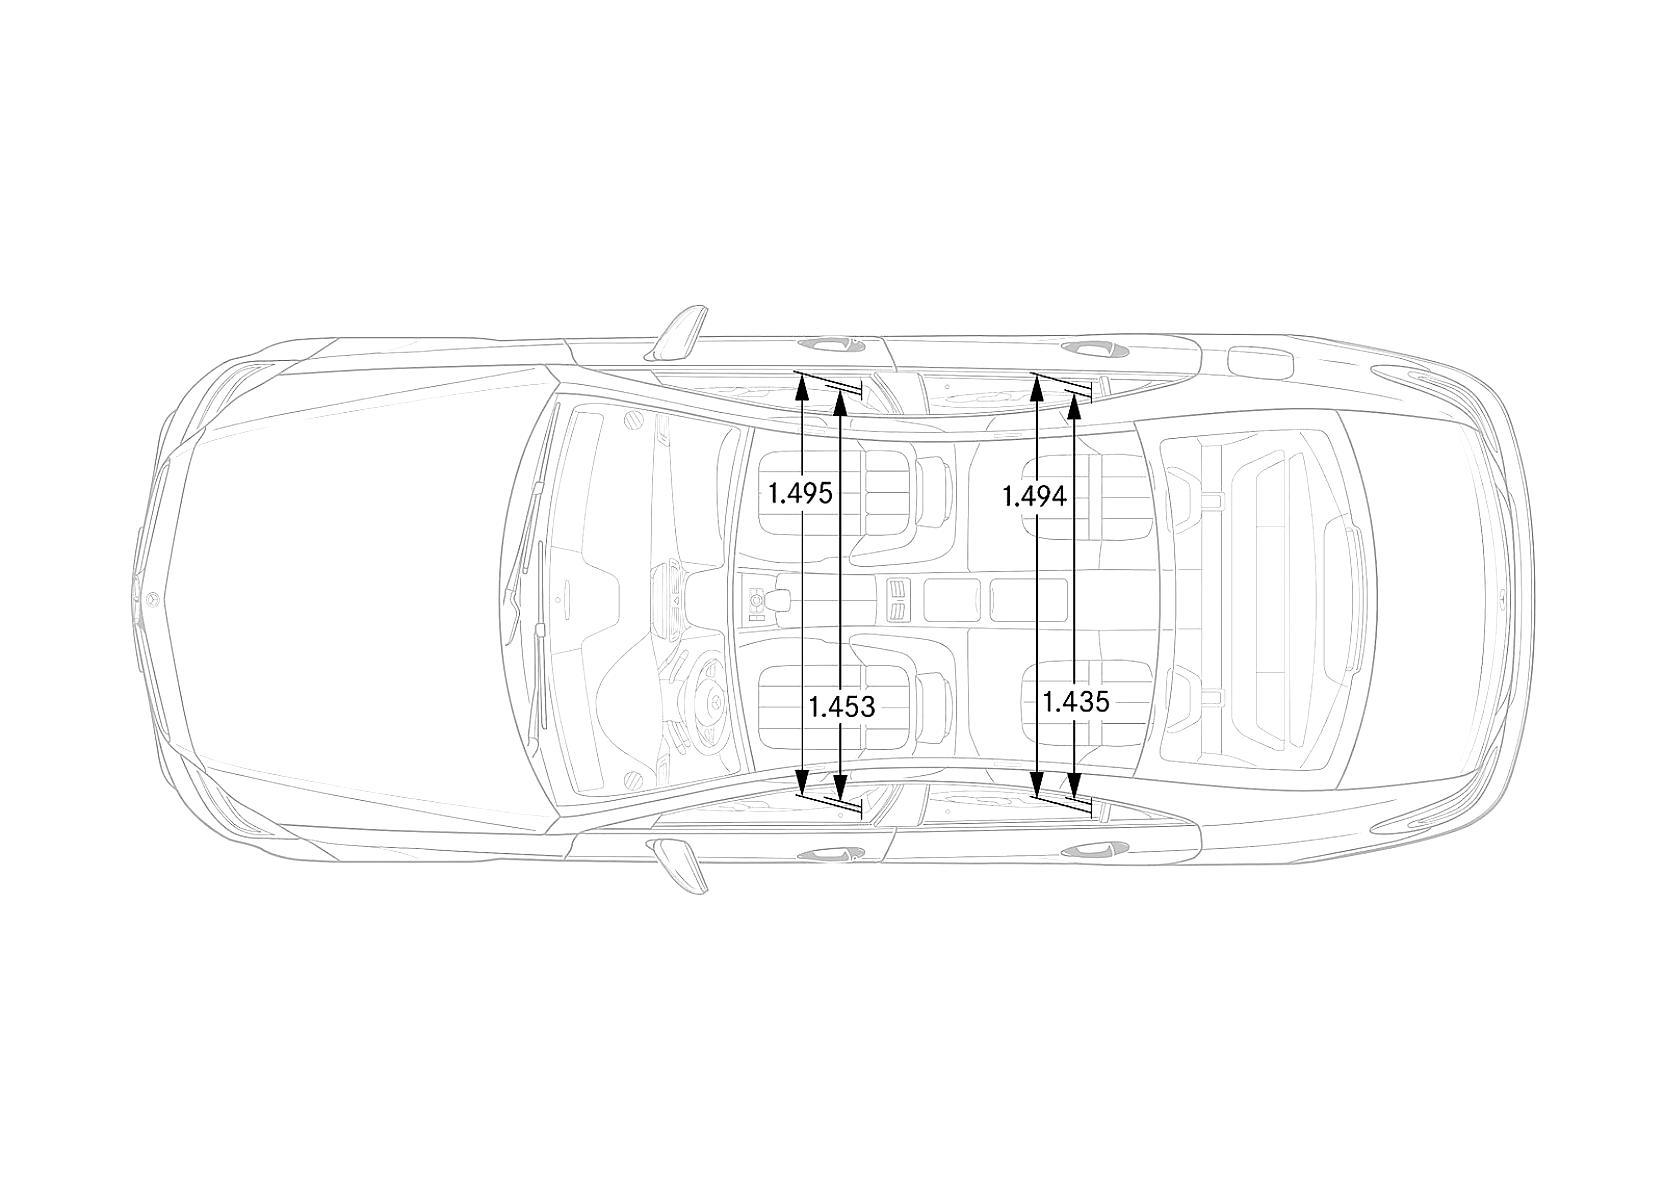 Mercedes Benz CLS Class C218 2014 on MotoImg.com